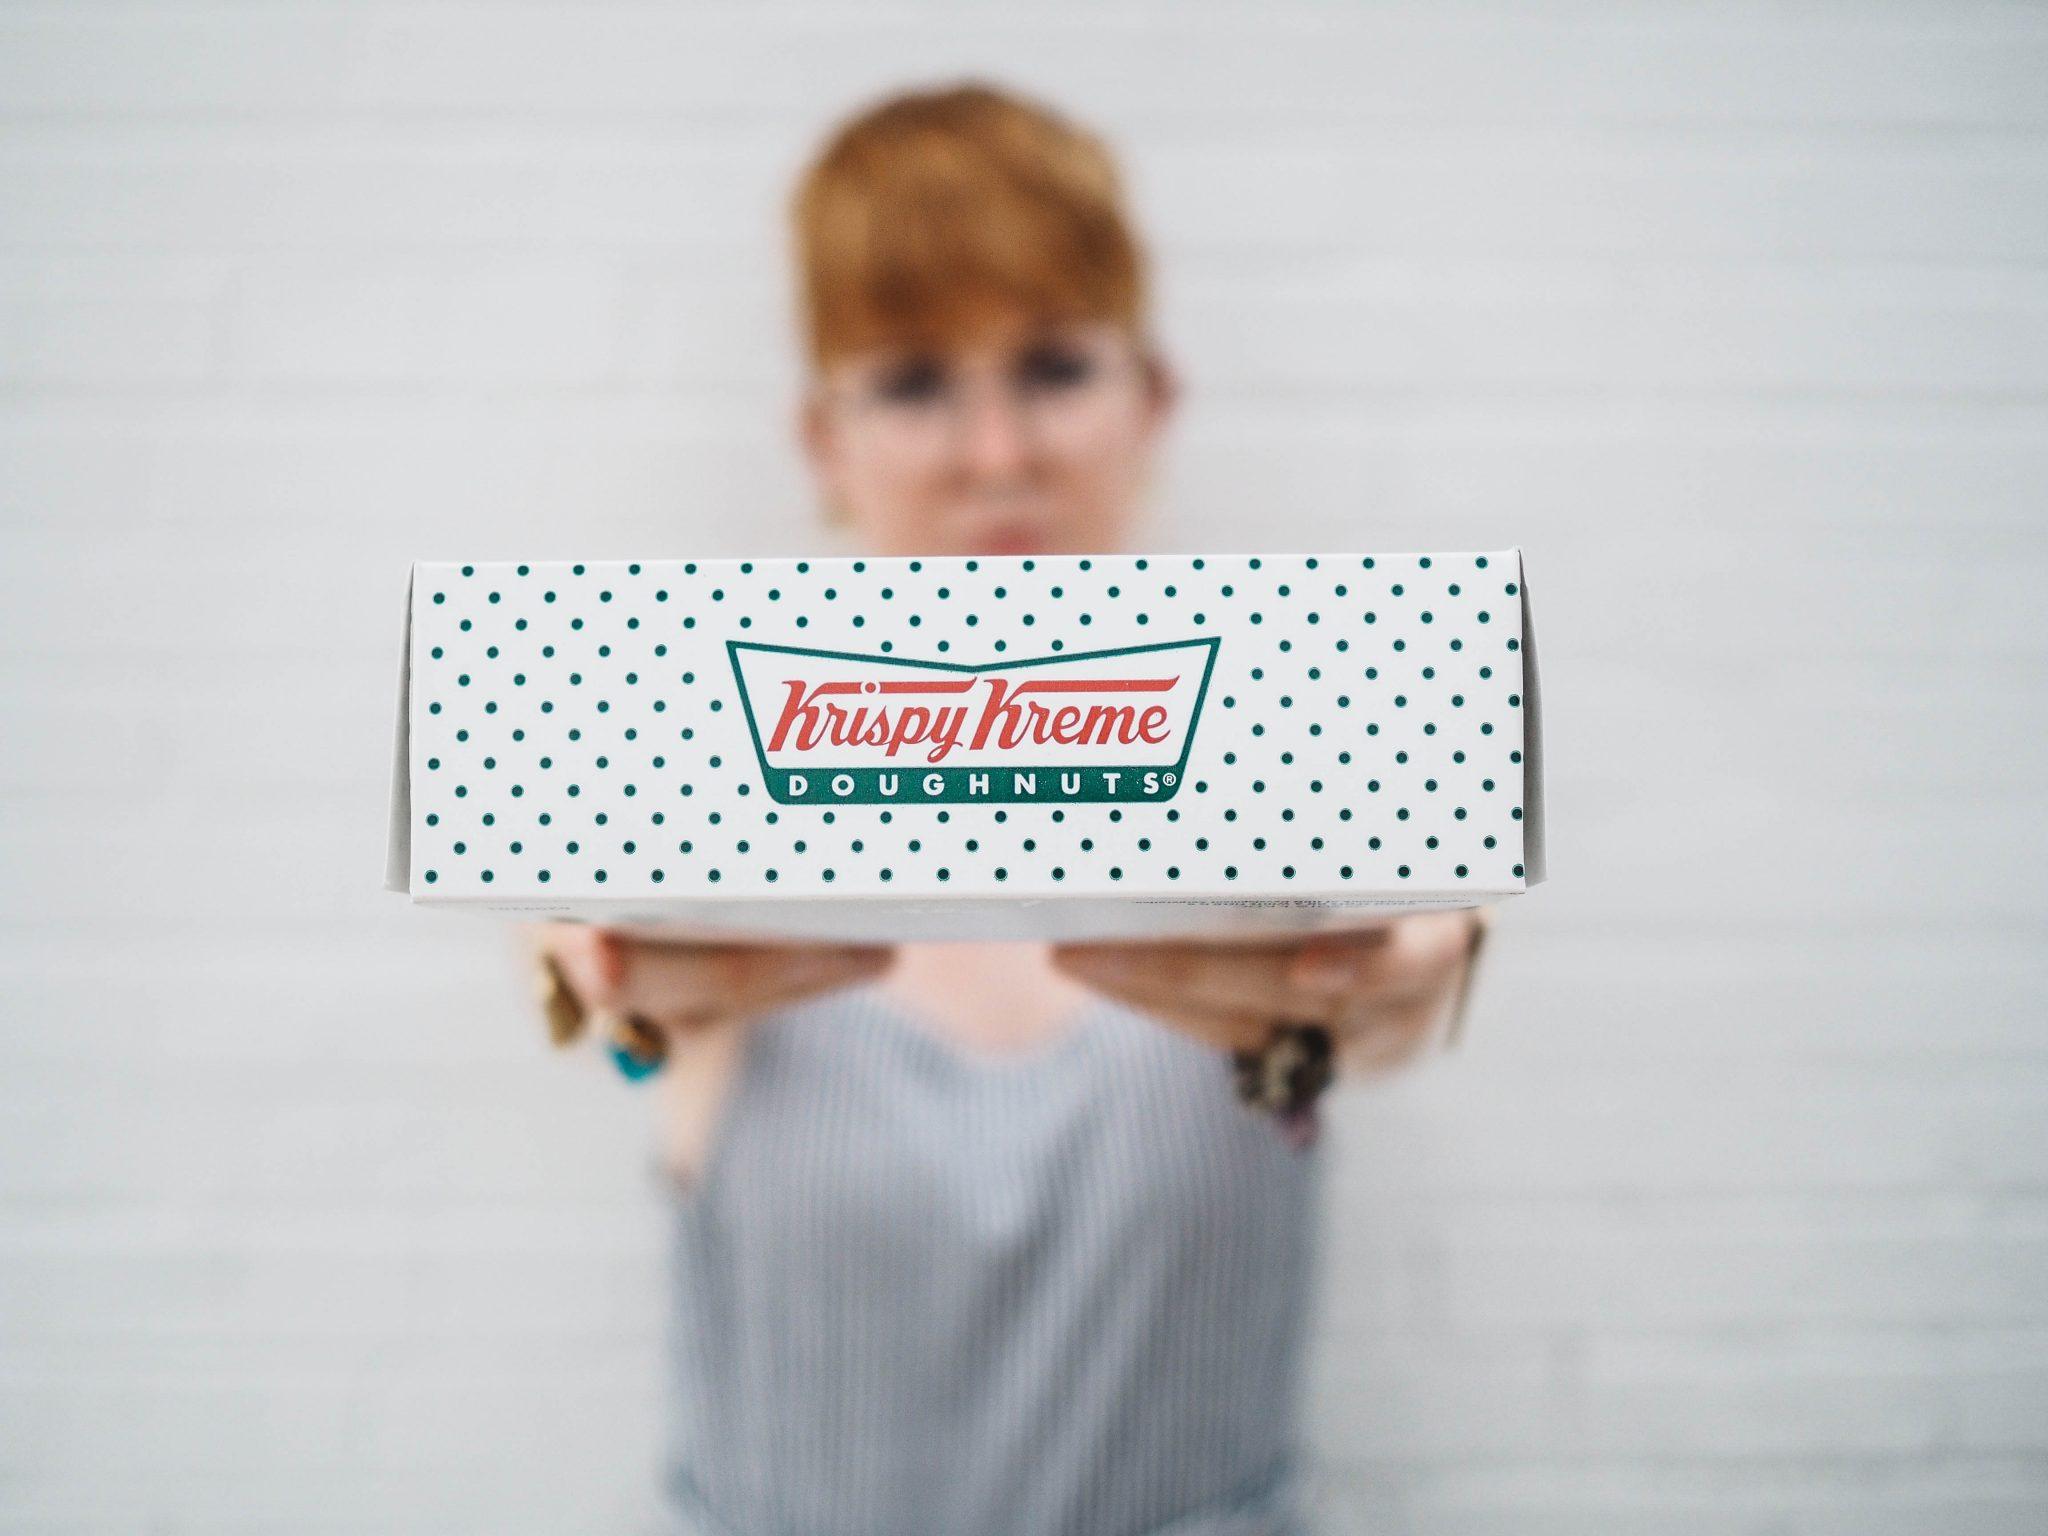 Krispy Kreme Celebrates Its Birthday With Celebrity Talent, Successful Satellite Media Tour